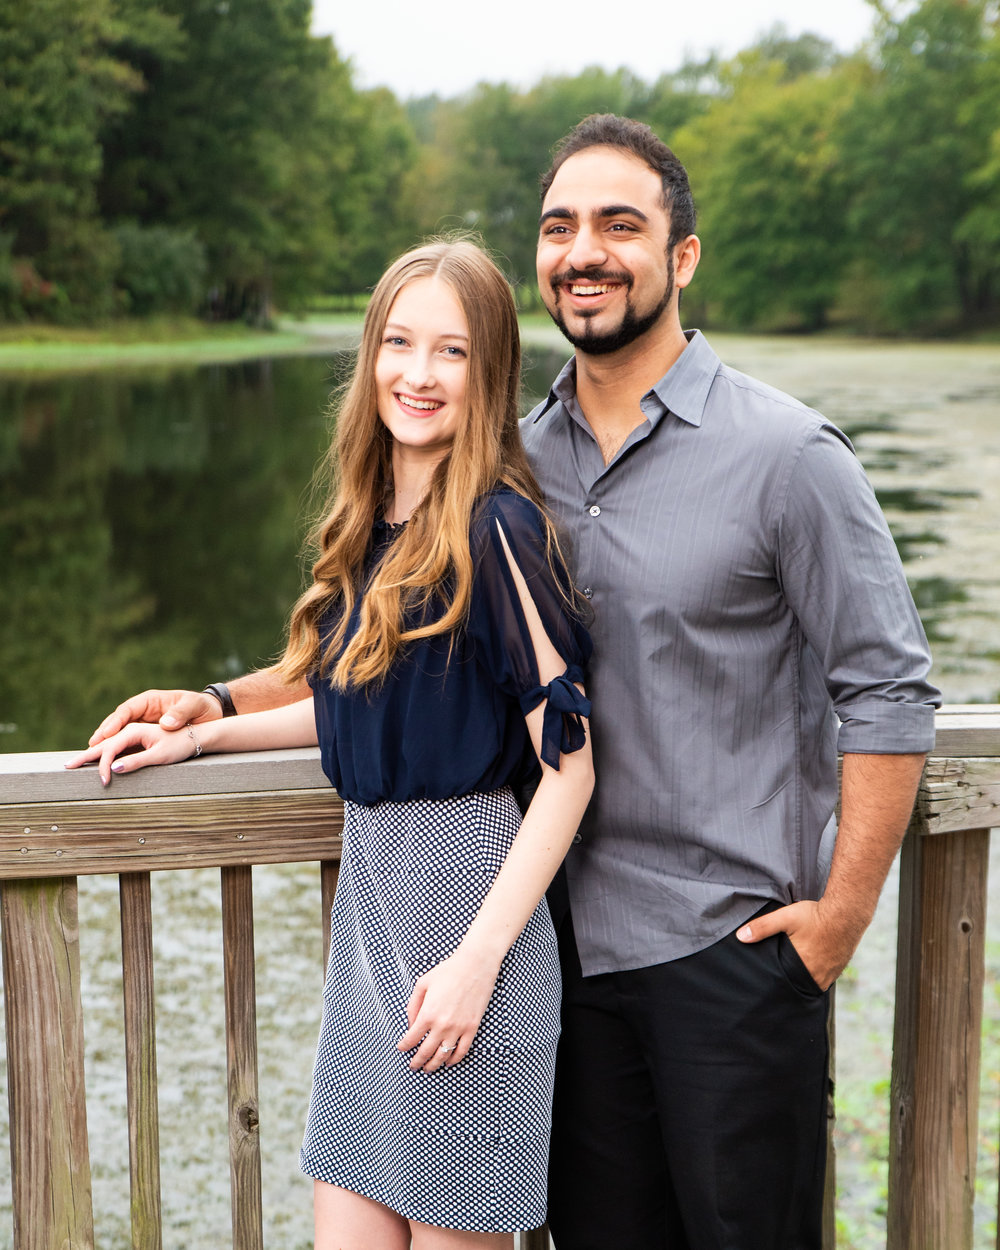 2018_October_06-Kaitlyn_Davood_Lake_Fairfax-51472.jpg